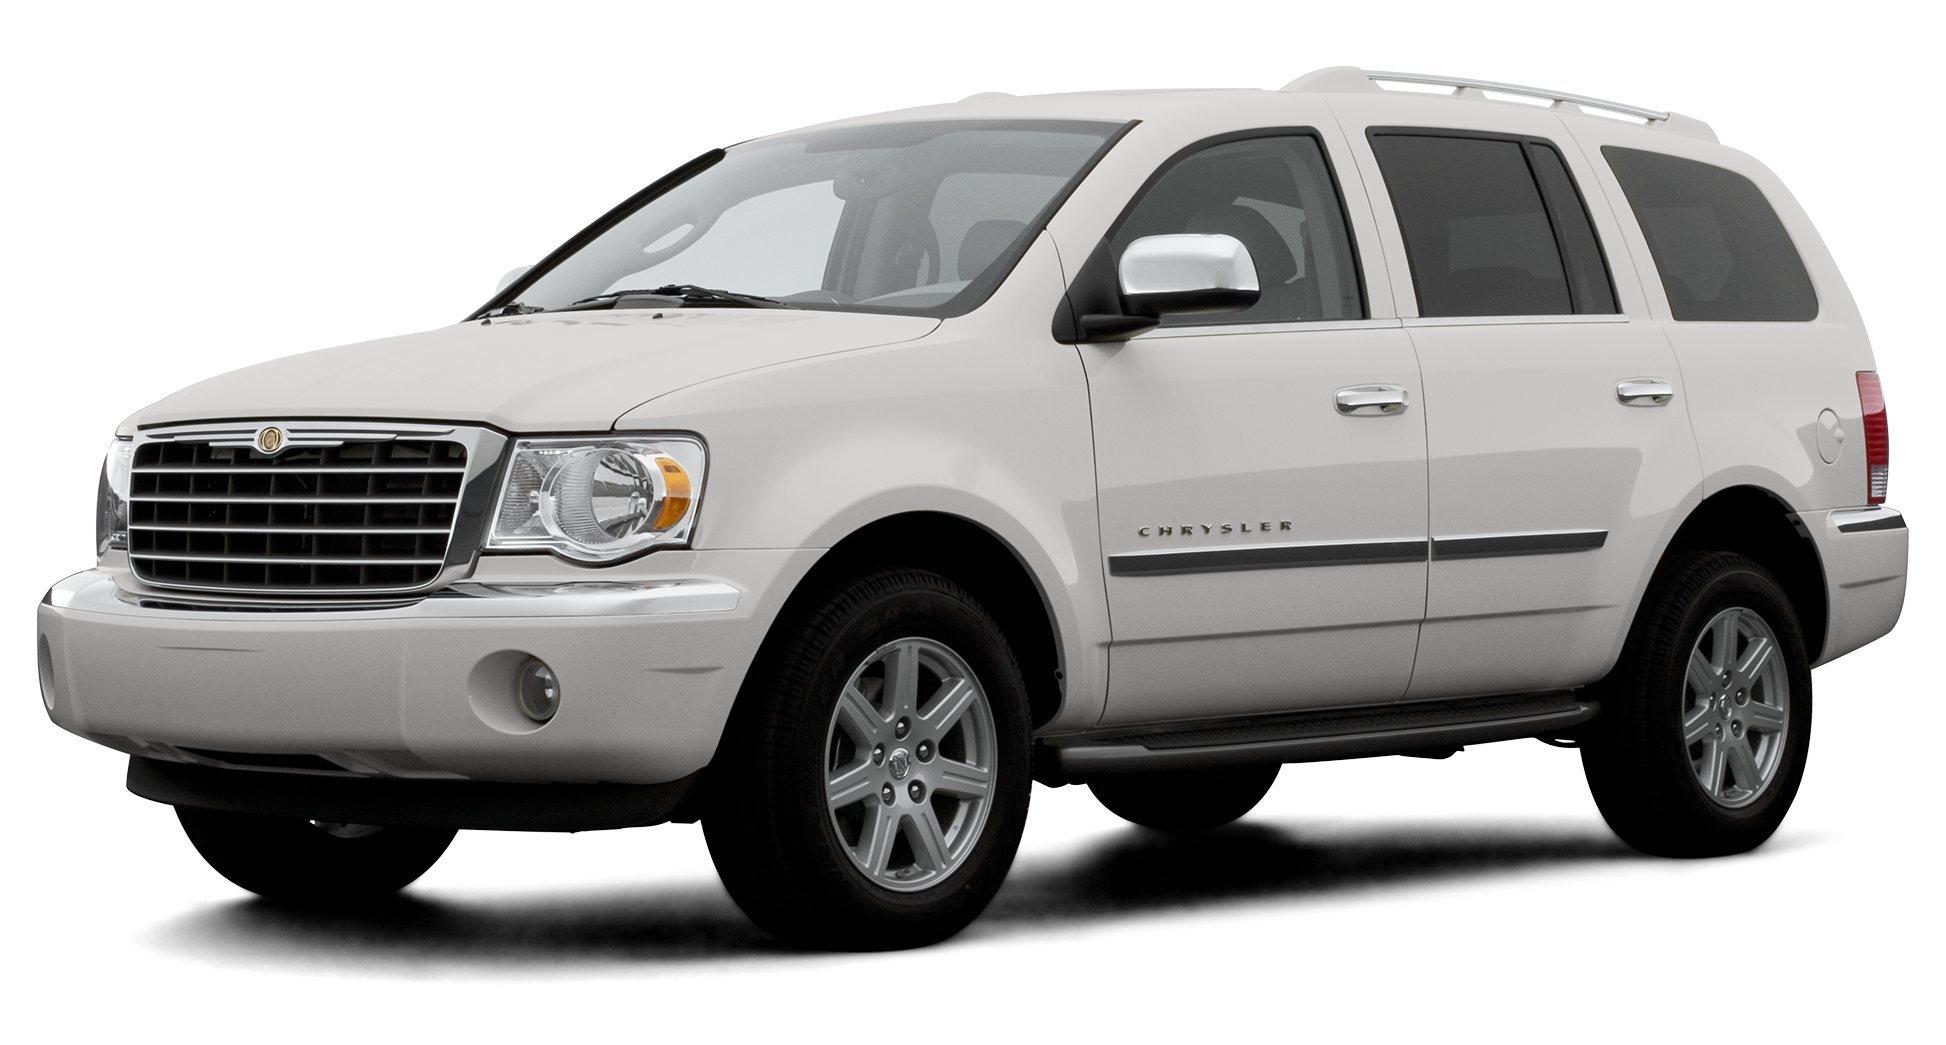 2007 Chrysler Aspen Limited, 2-Wheel Drive 4-Door ...